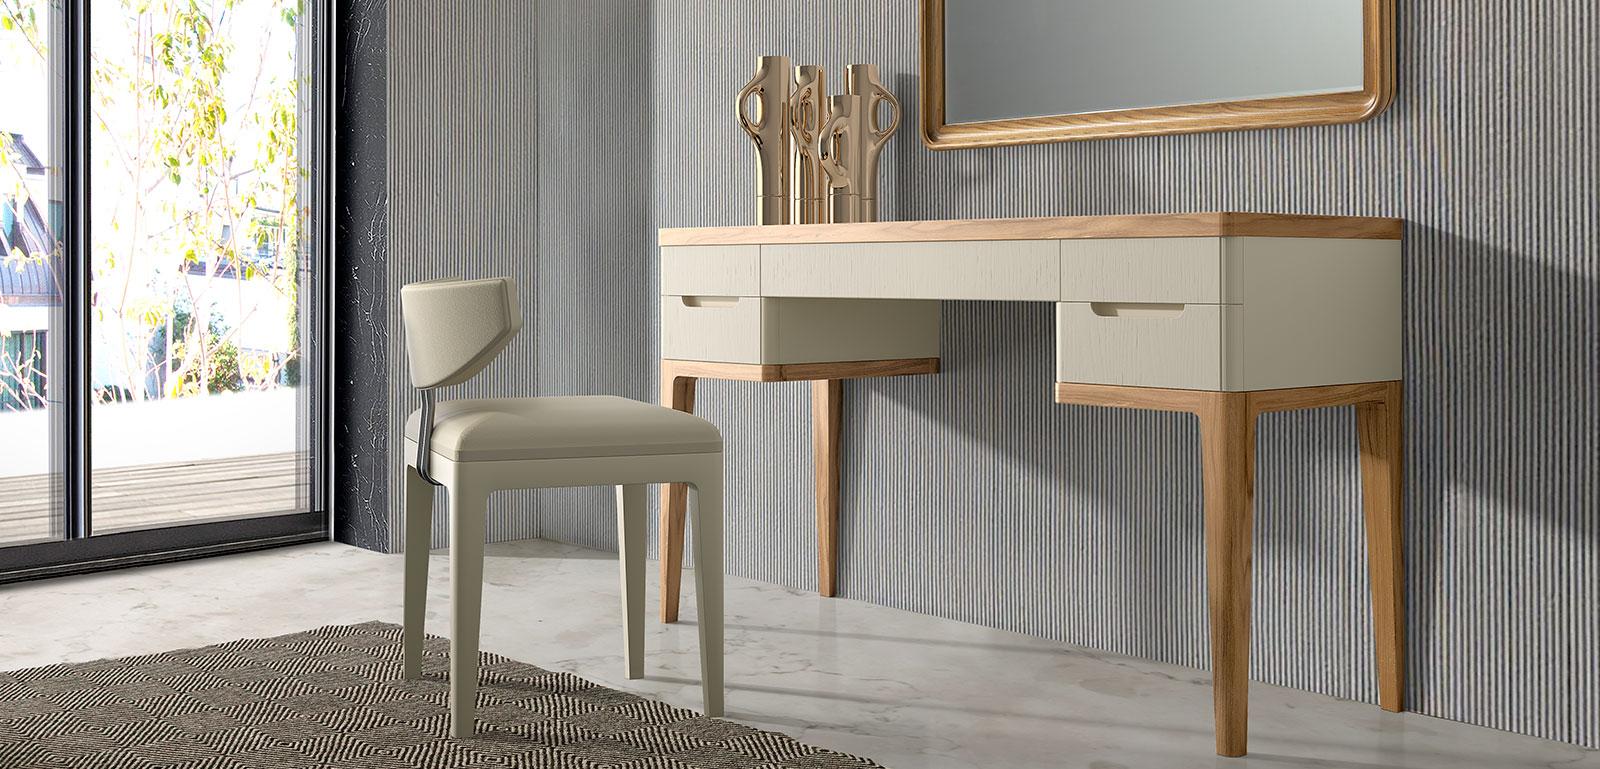 Muebles monrabal chirivella banqueta colecci n valentina for Mobiliario de dormitorio